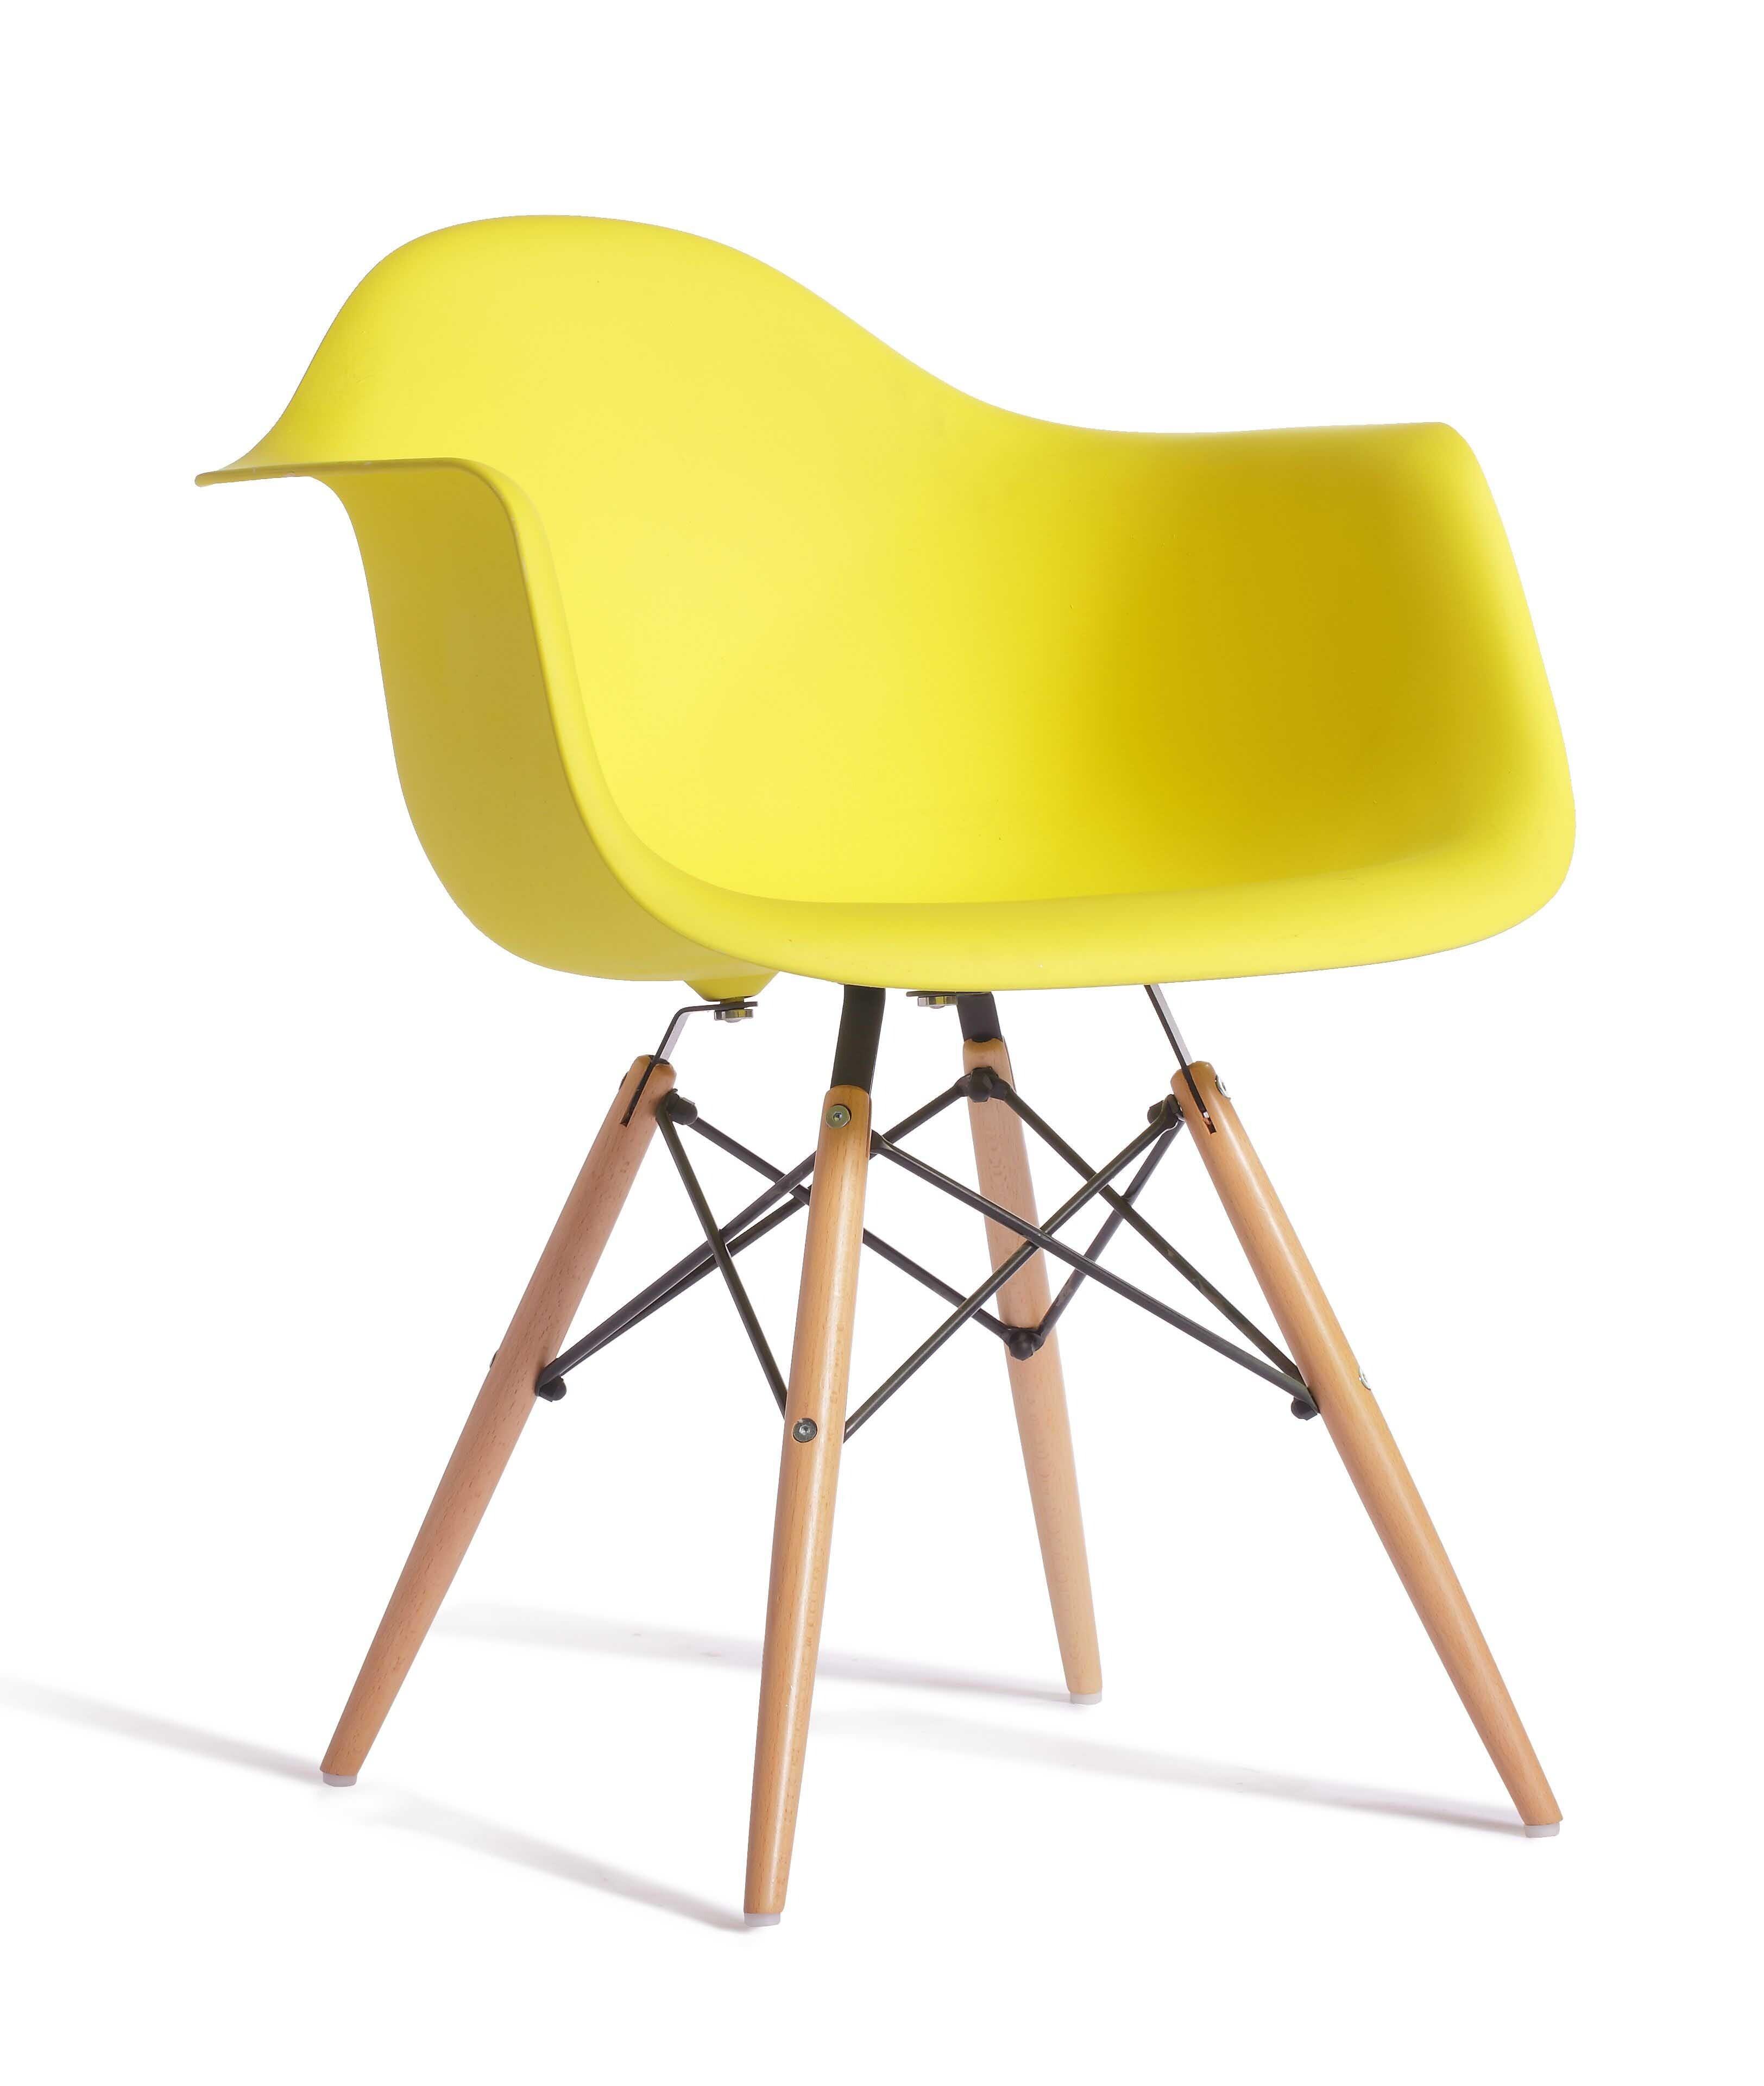 Eames replica designer arm chair yellow furniture for Replica designer furniture usa